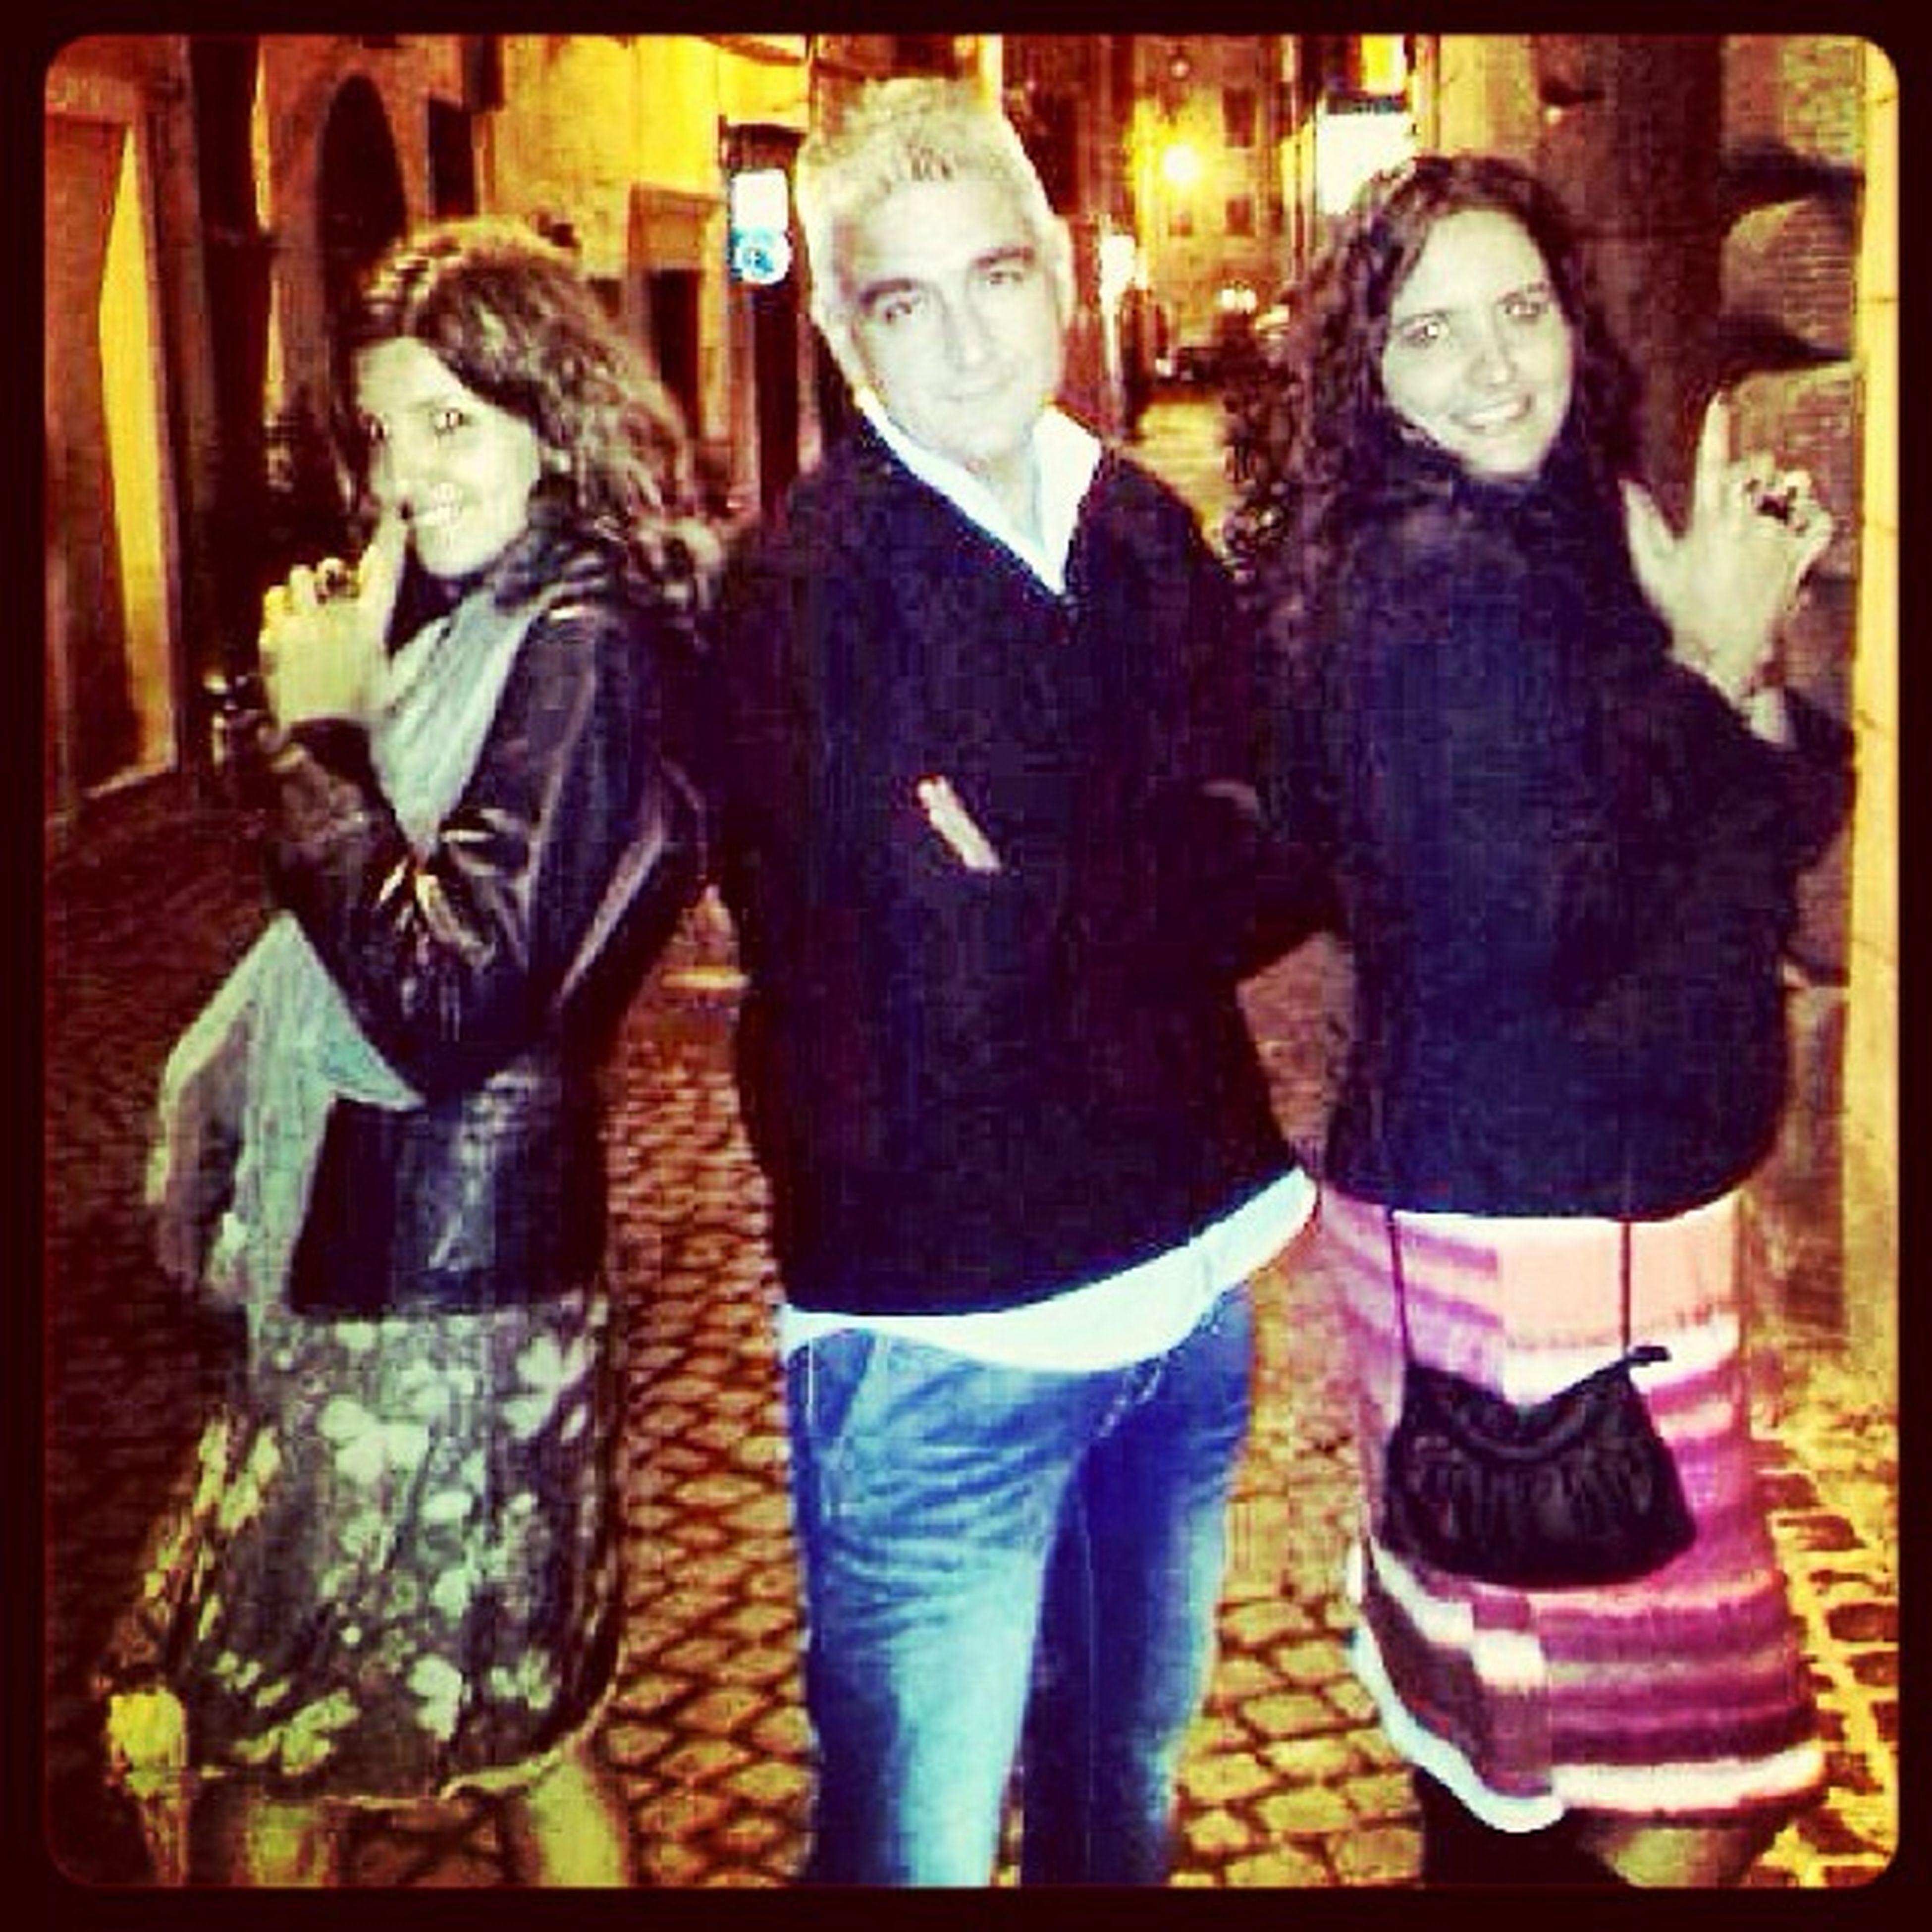 """Il mio nome è Bond, WelBond, e queste sono le mie WelBond Girls"" Photo By Pinto Laganà Bond Welbond Girls Romina annarita pintolaganà welbo roma rome"